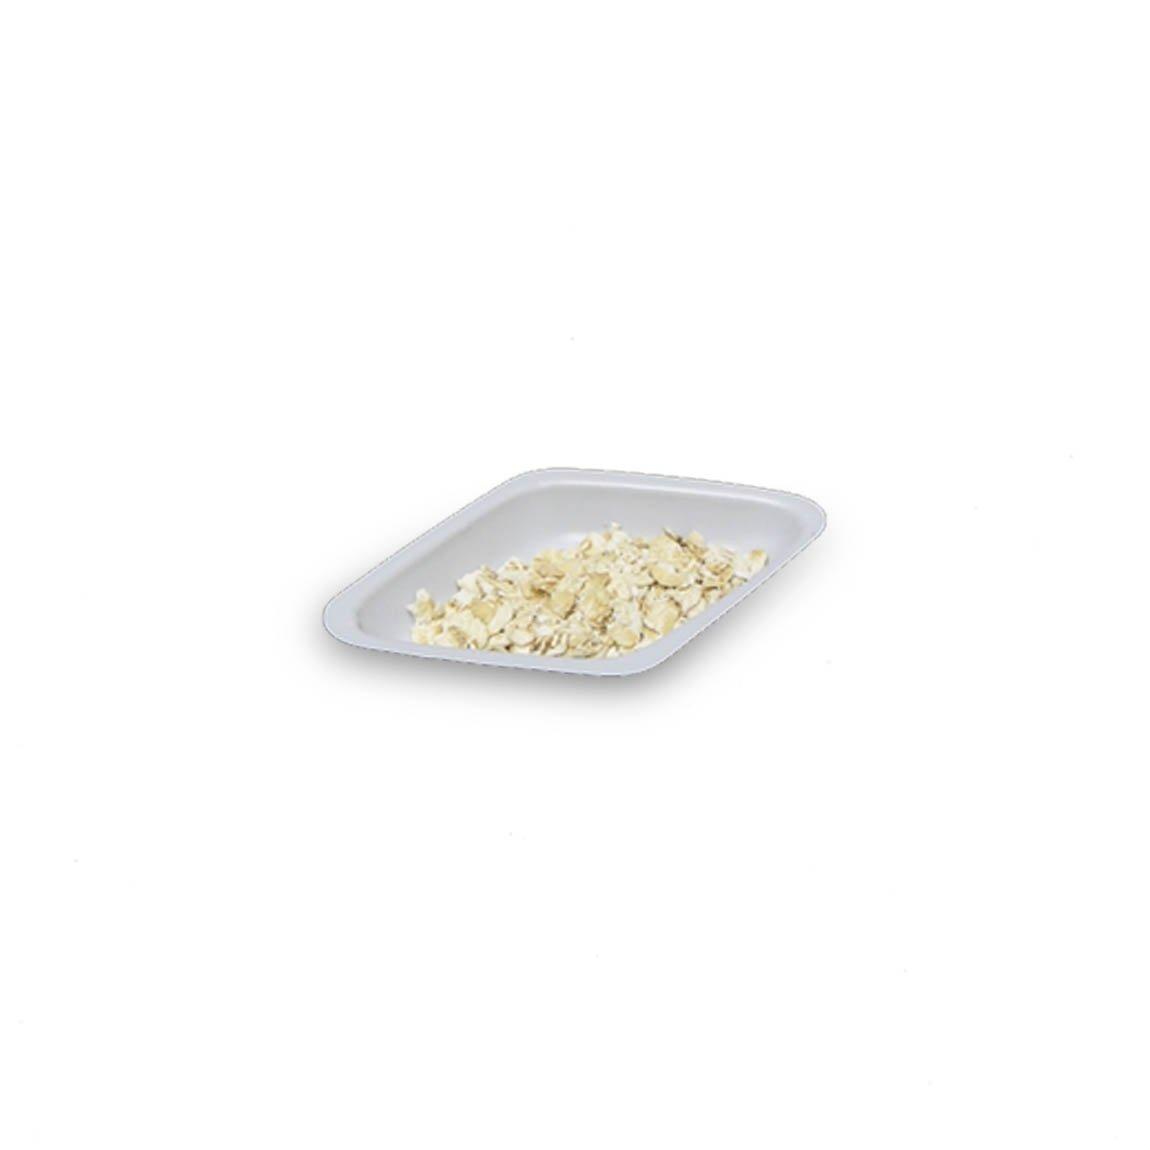 5mL White Antistatic Polystyrene Diamond Shaped Weigh Boat (30 Packs/Case - 500/Pack)